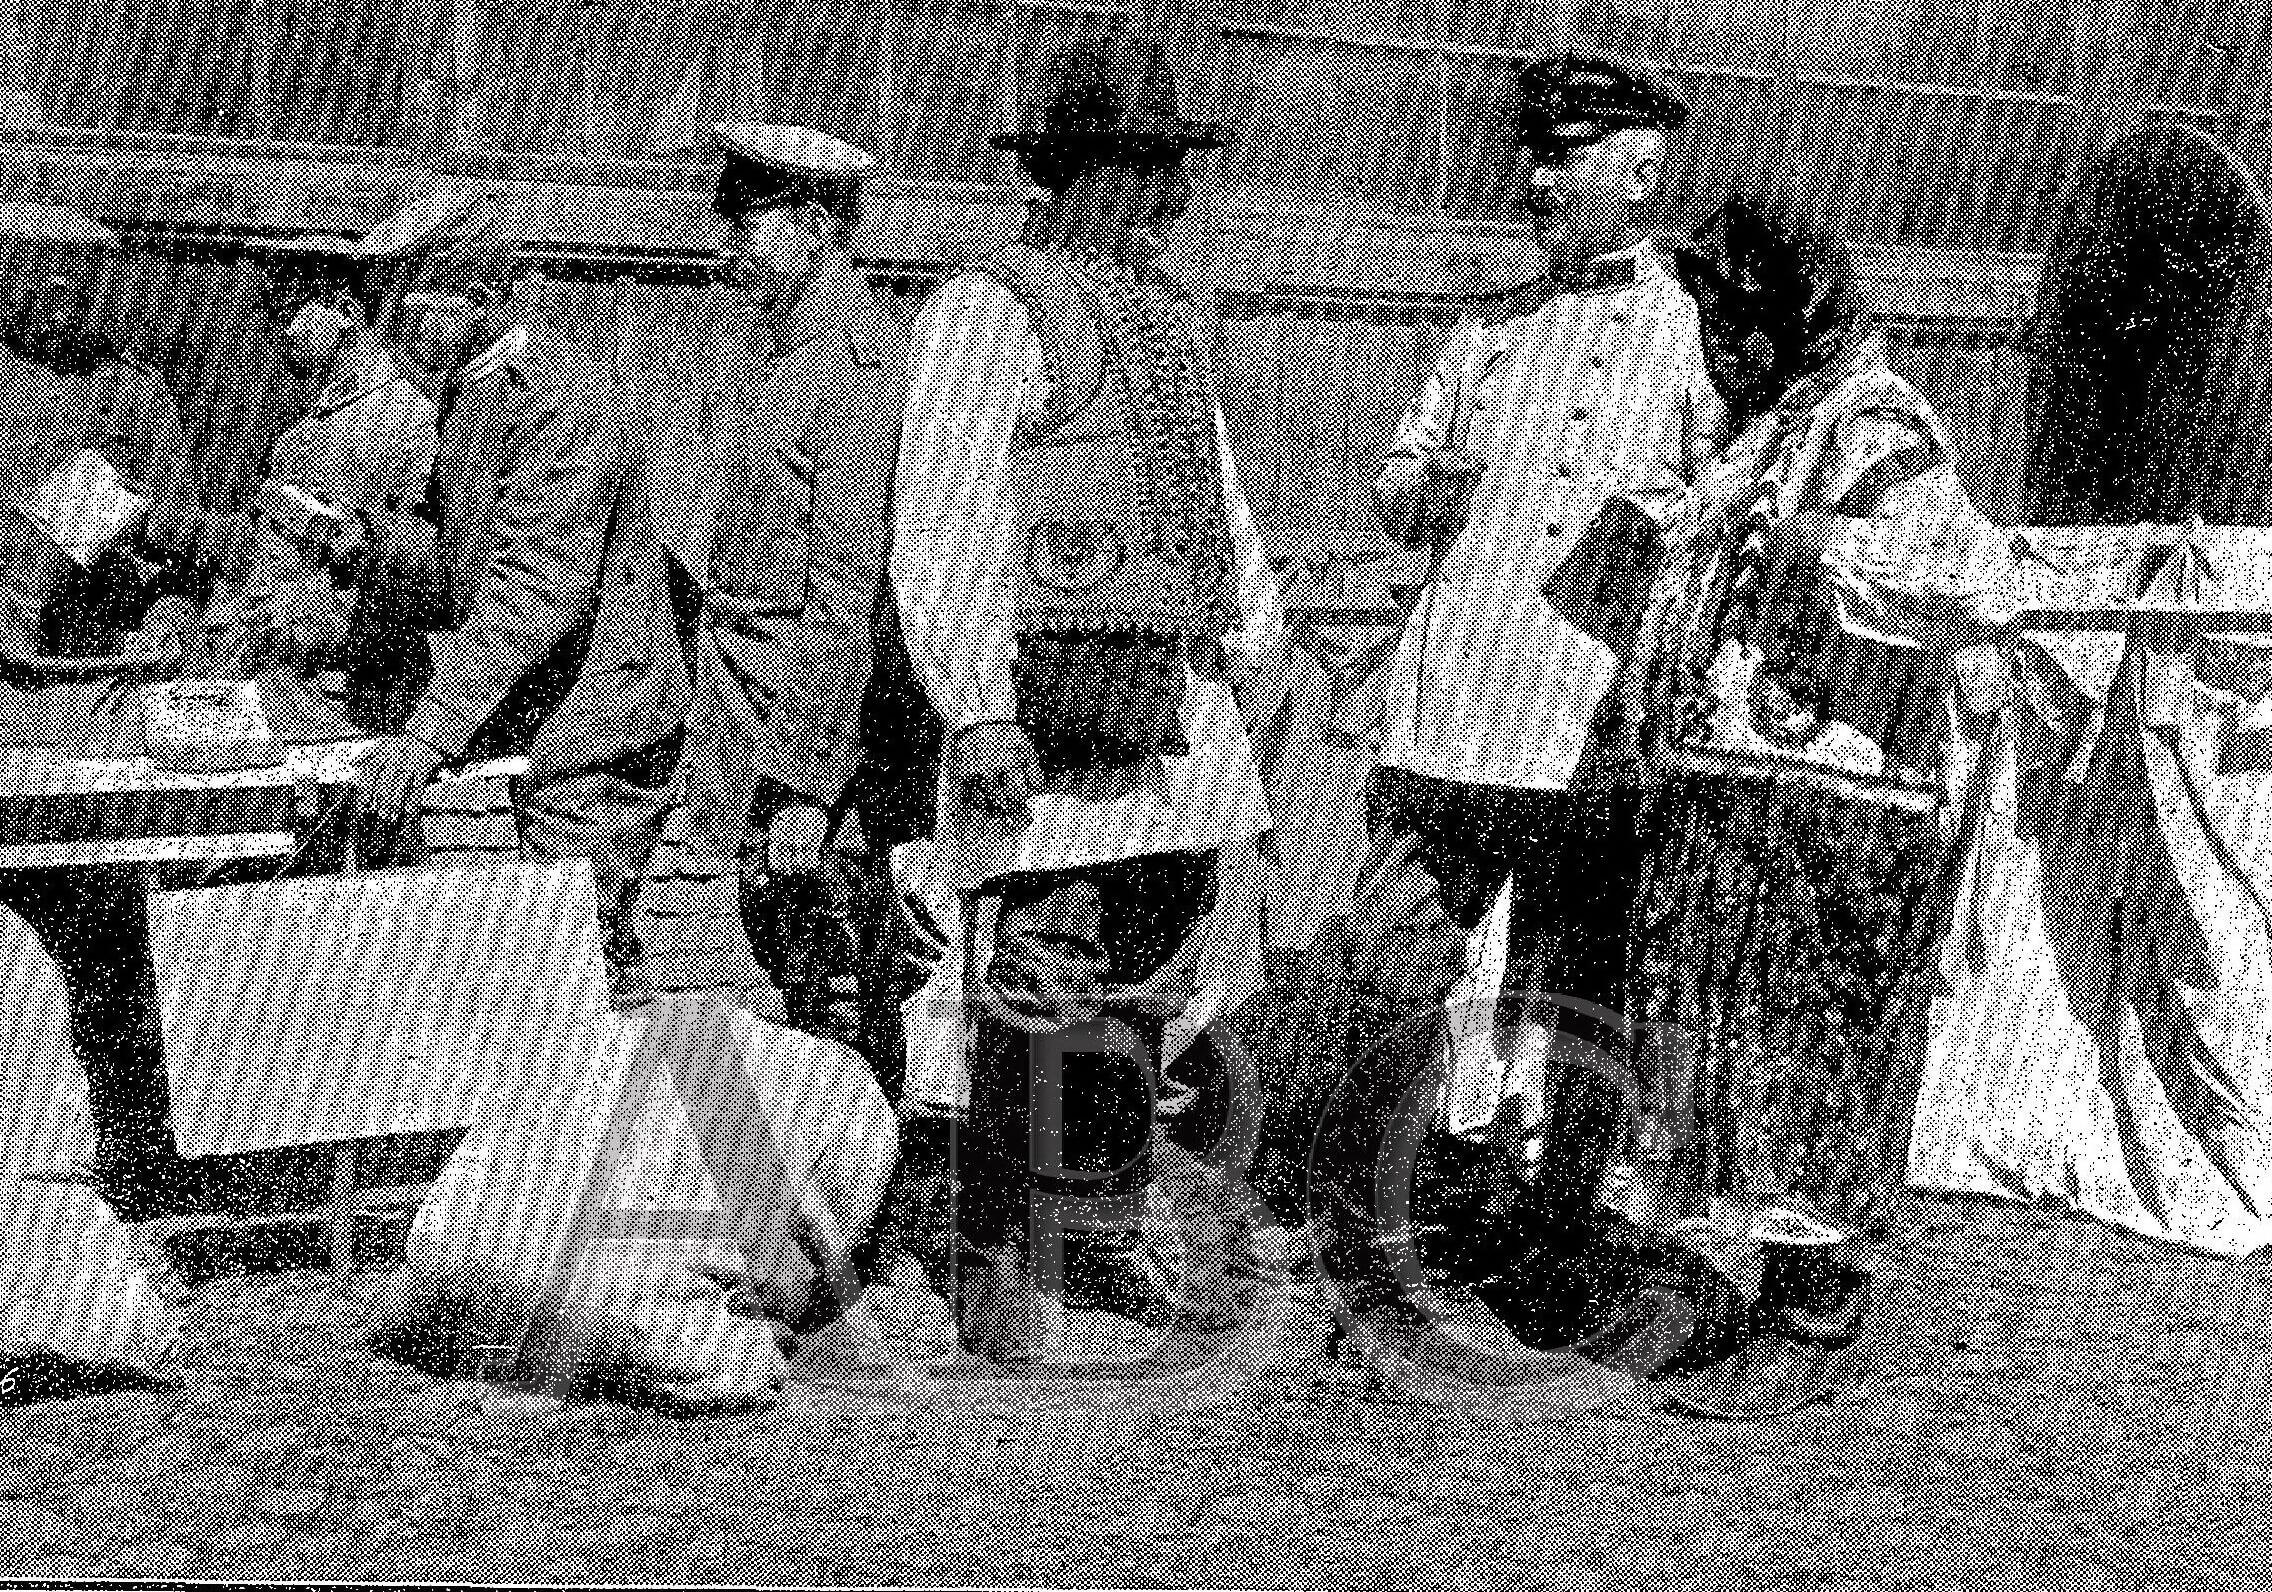 Spanish Images of War Time Lviv